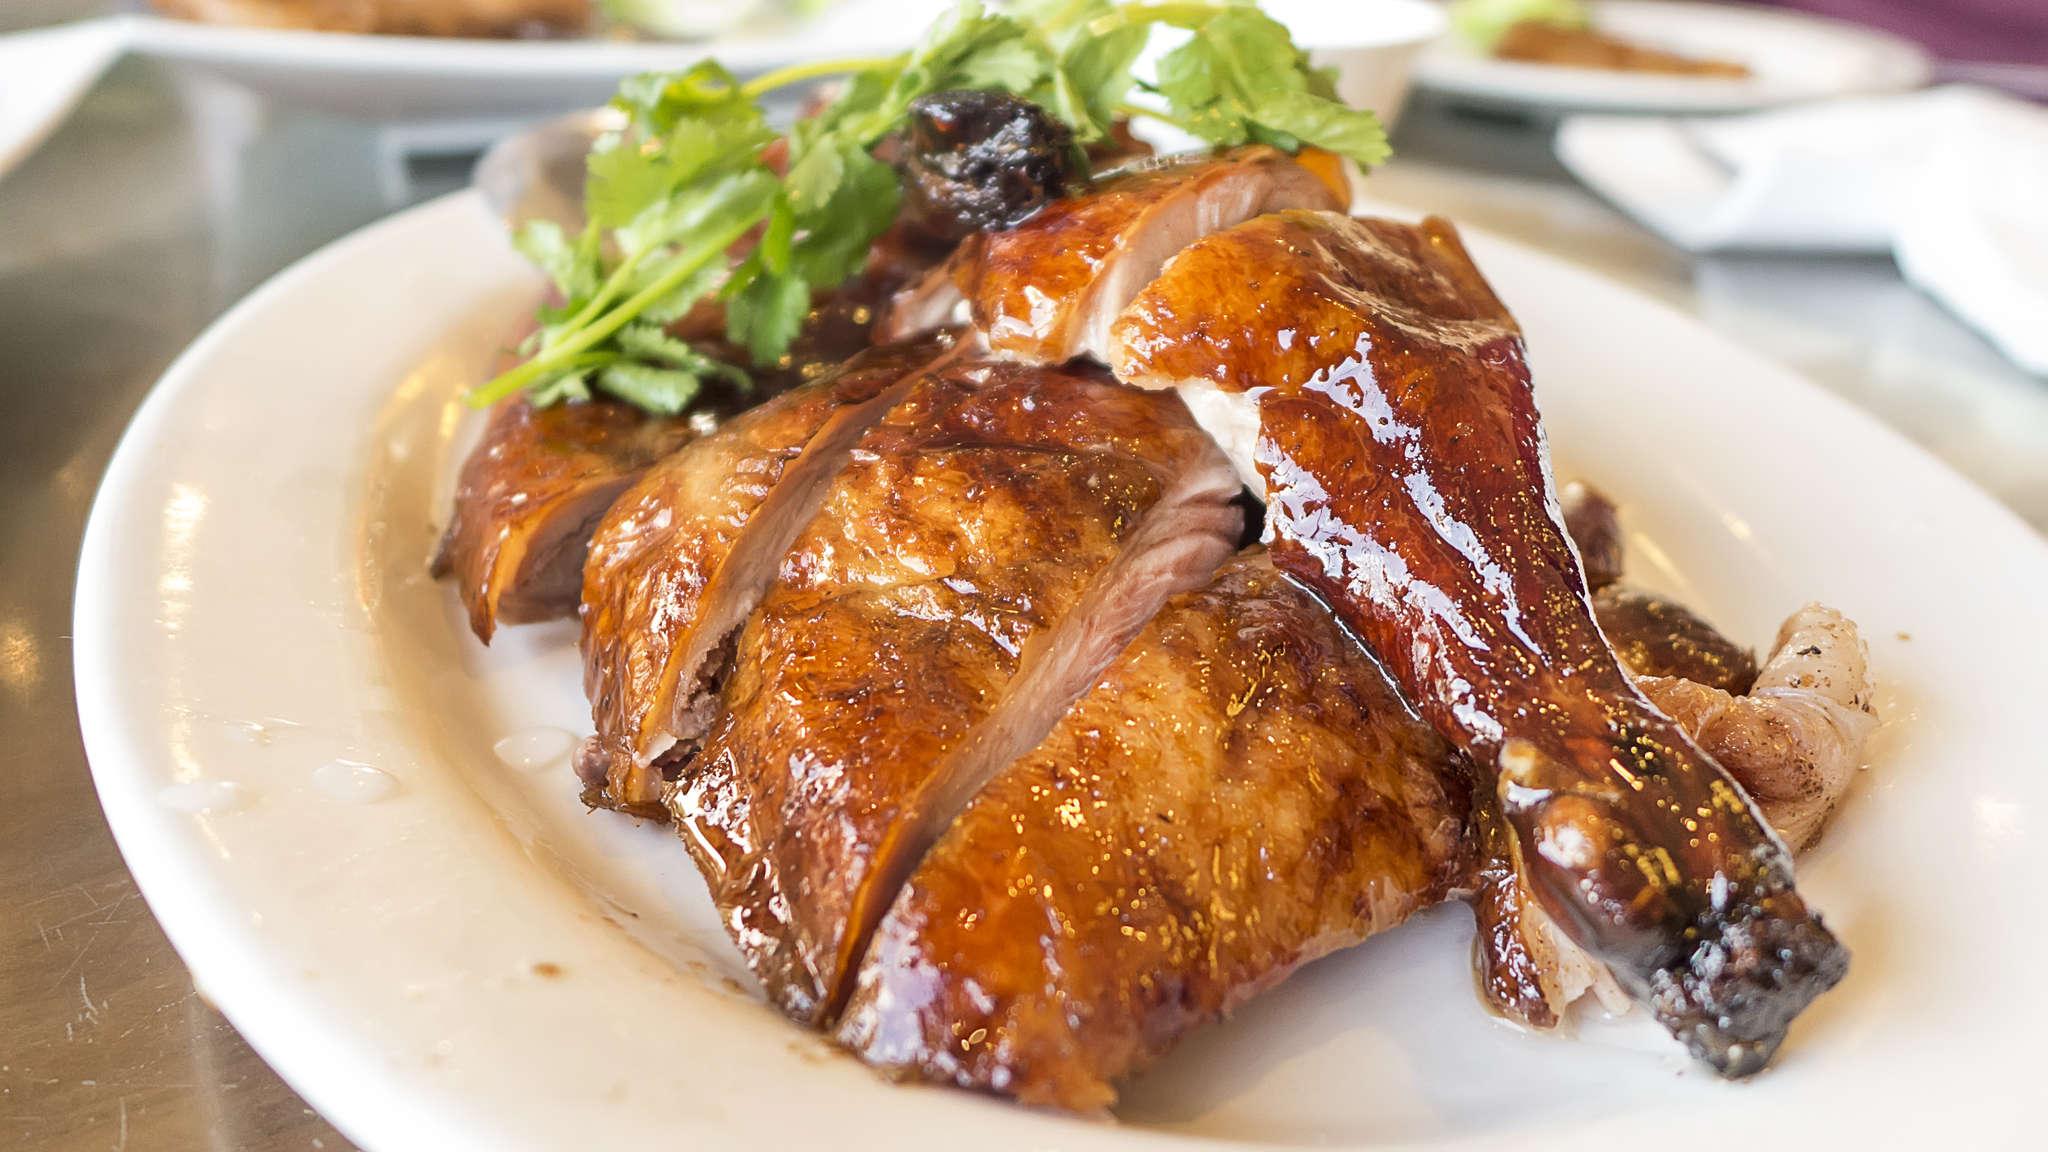 This roast duck is one of the hidden gems at under-the-radar Hong Kong Food Street.